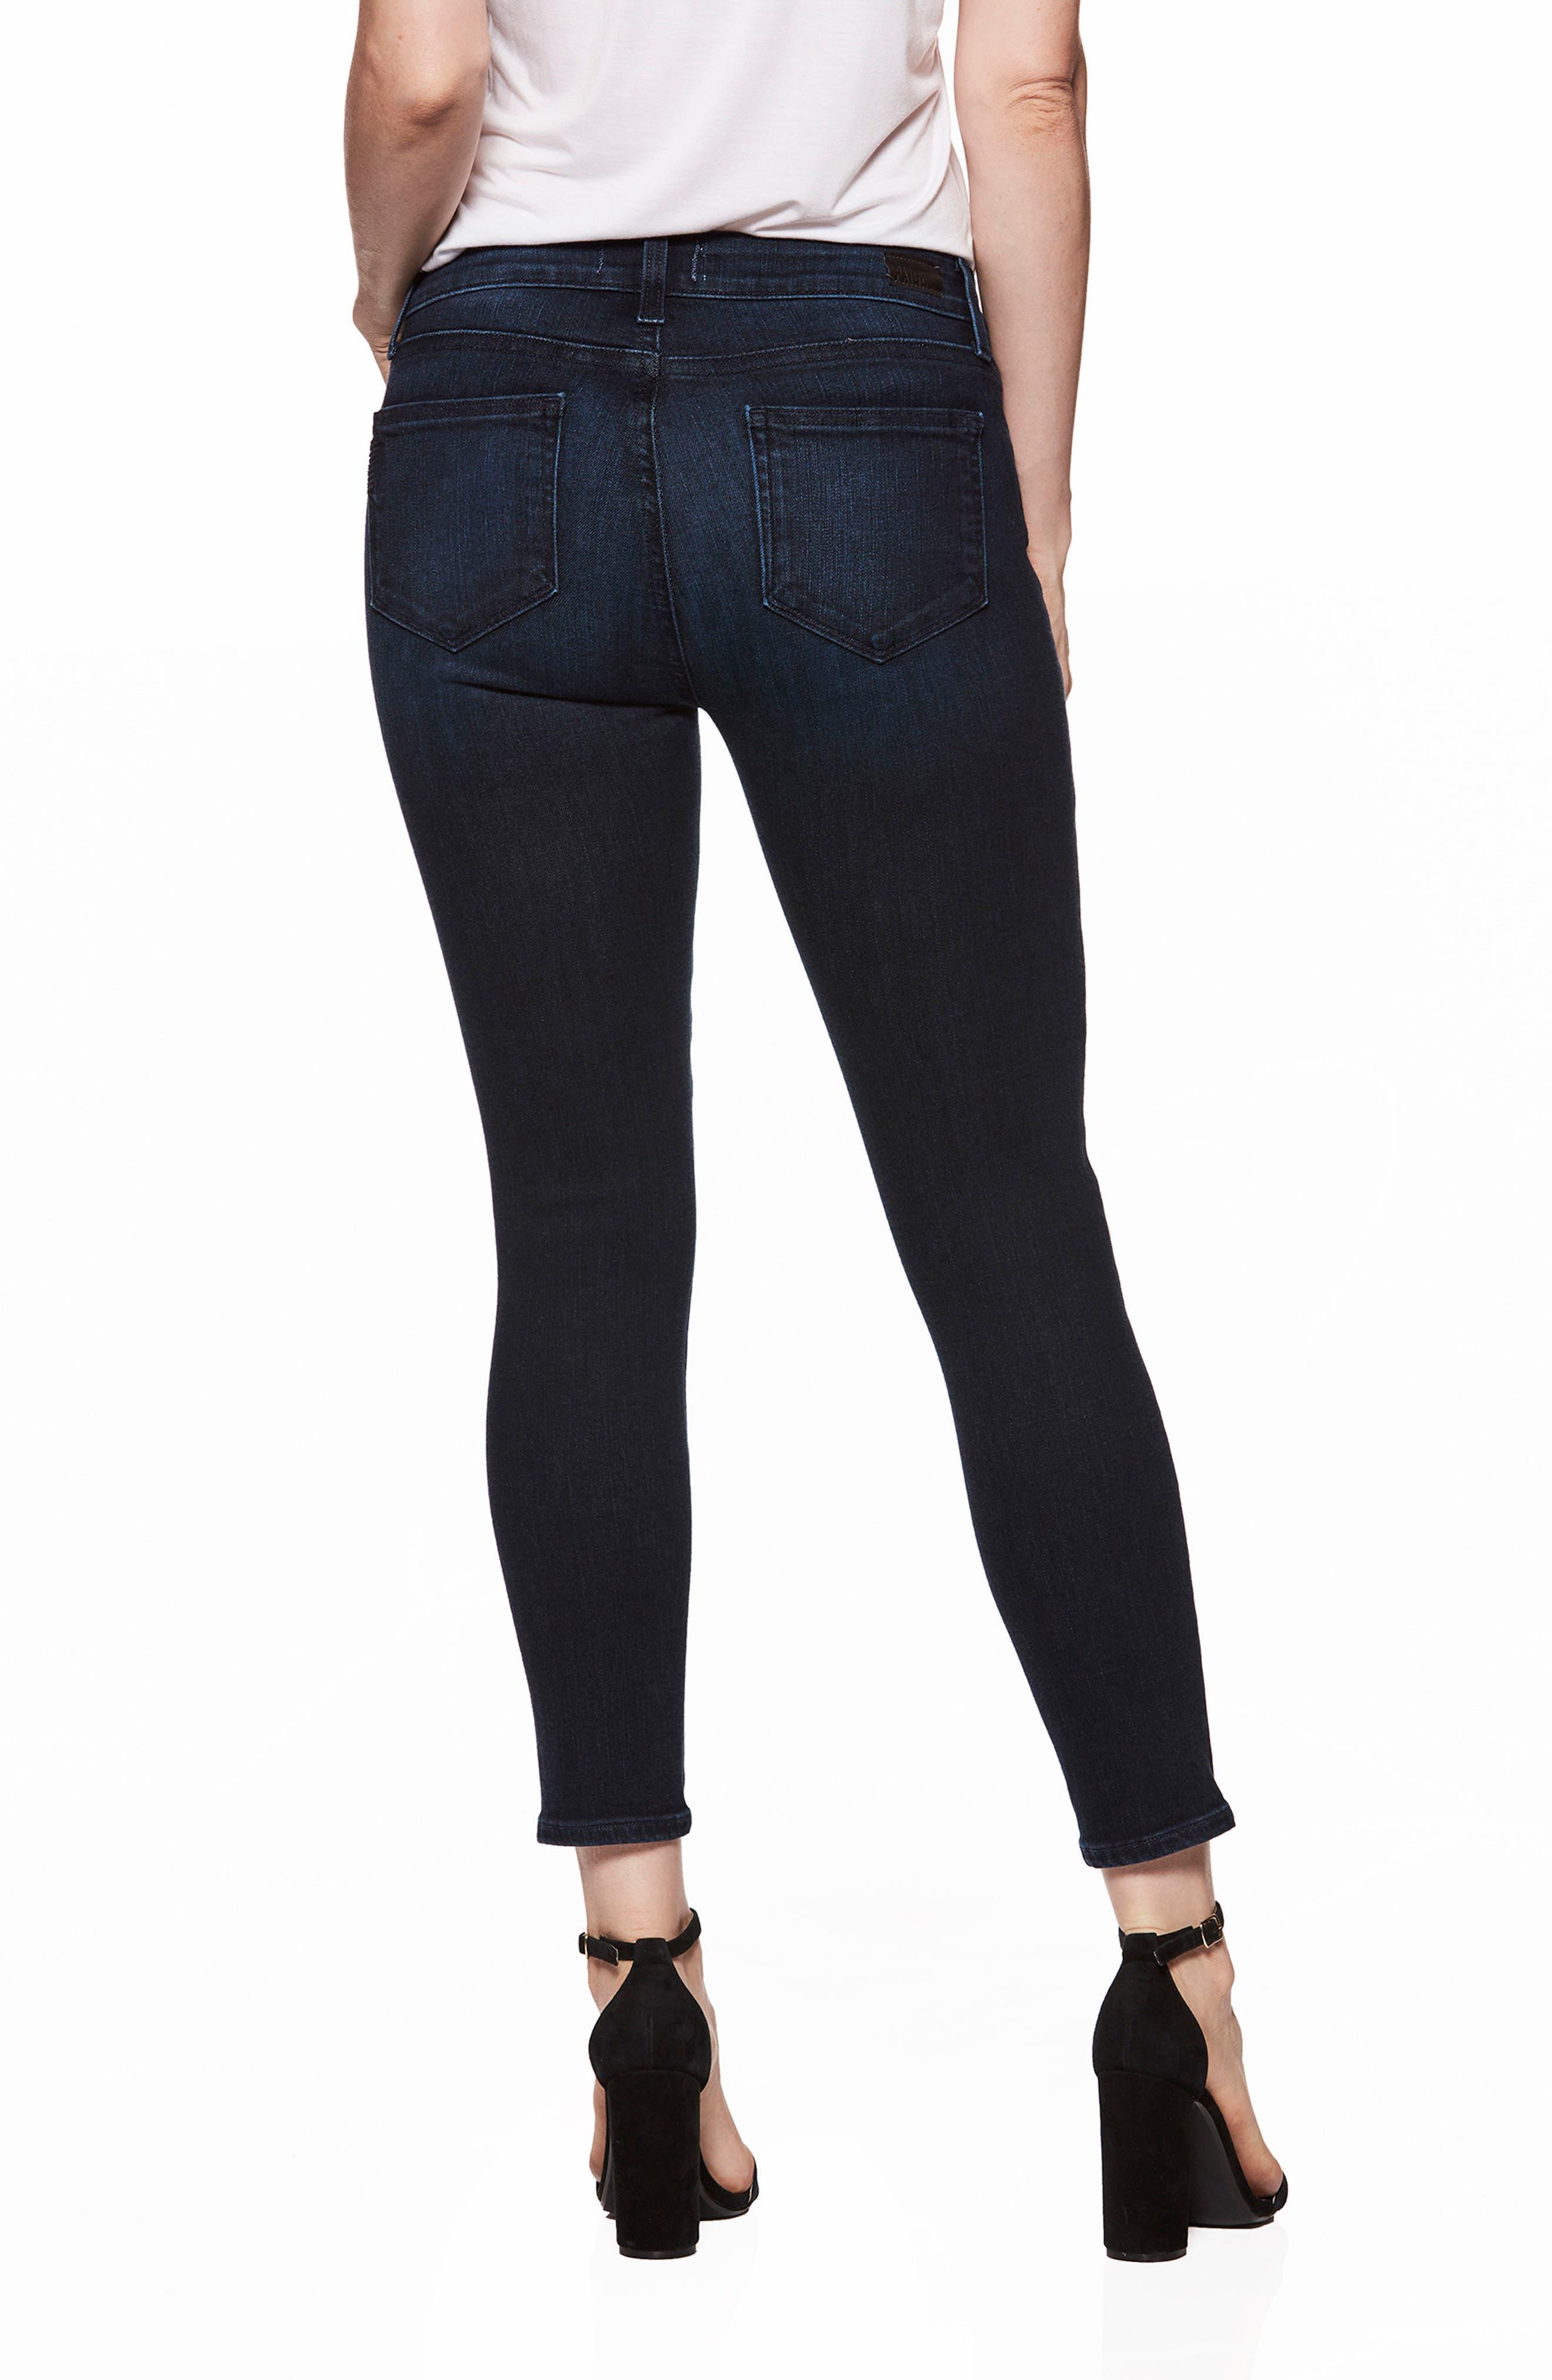 Transcend Vintage - Verdugo Crop Ultra Skinny Jeans,                             Alternate thumbnail 2, color,                             LUELLA